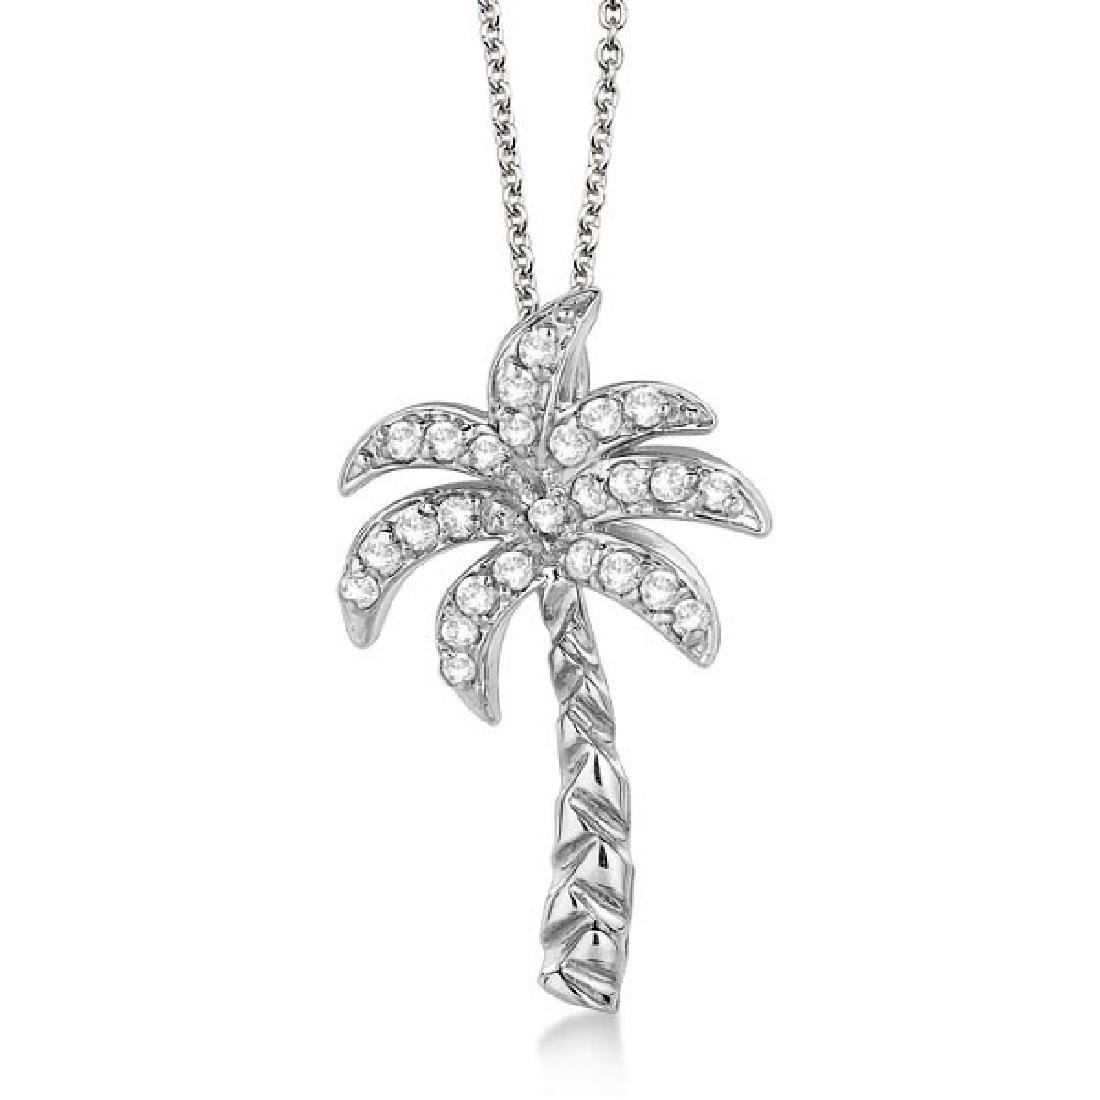 Palm Tree Shaped Diamond Pendant Necklace 14k White Gol